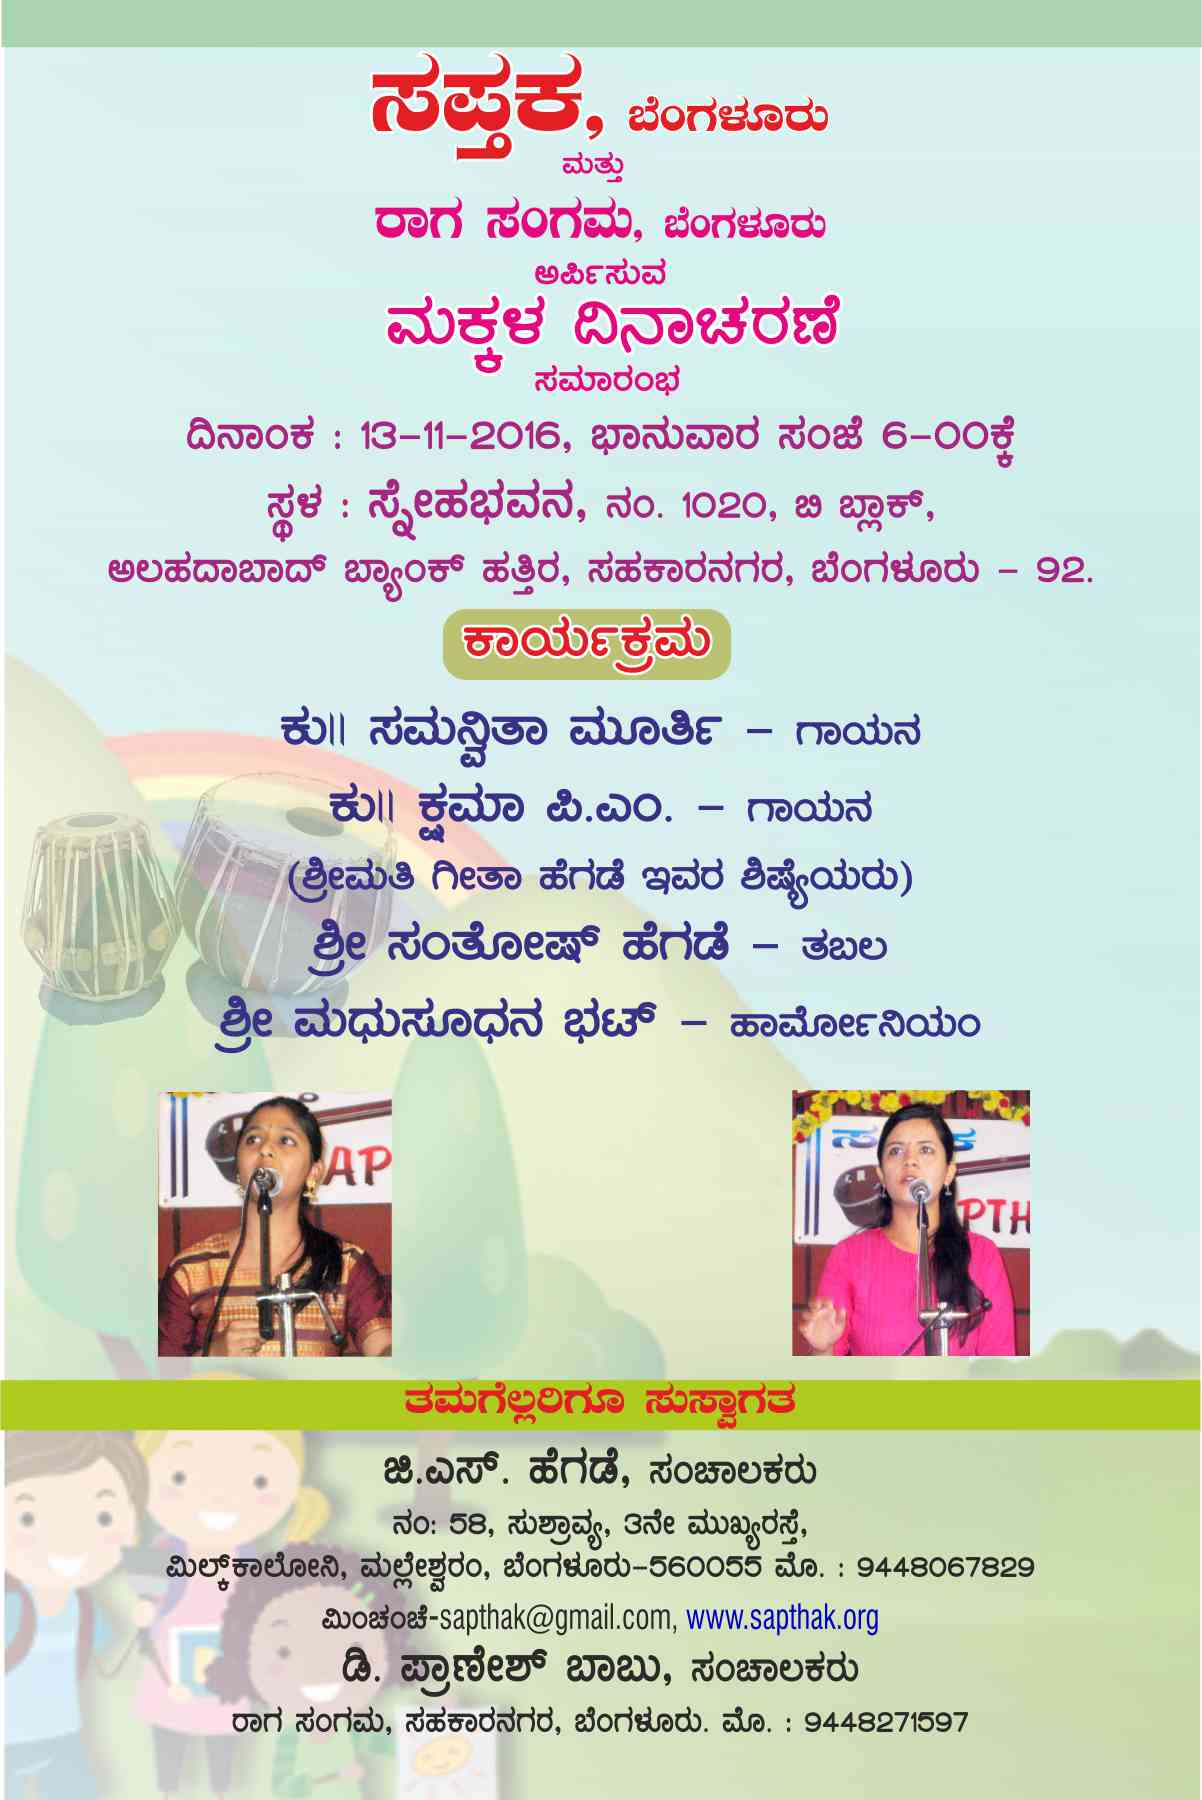 13 - 11Ragasangama Kannada 2016